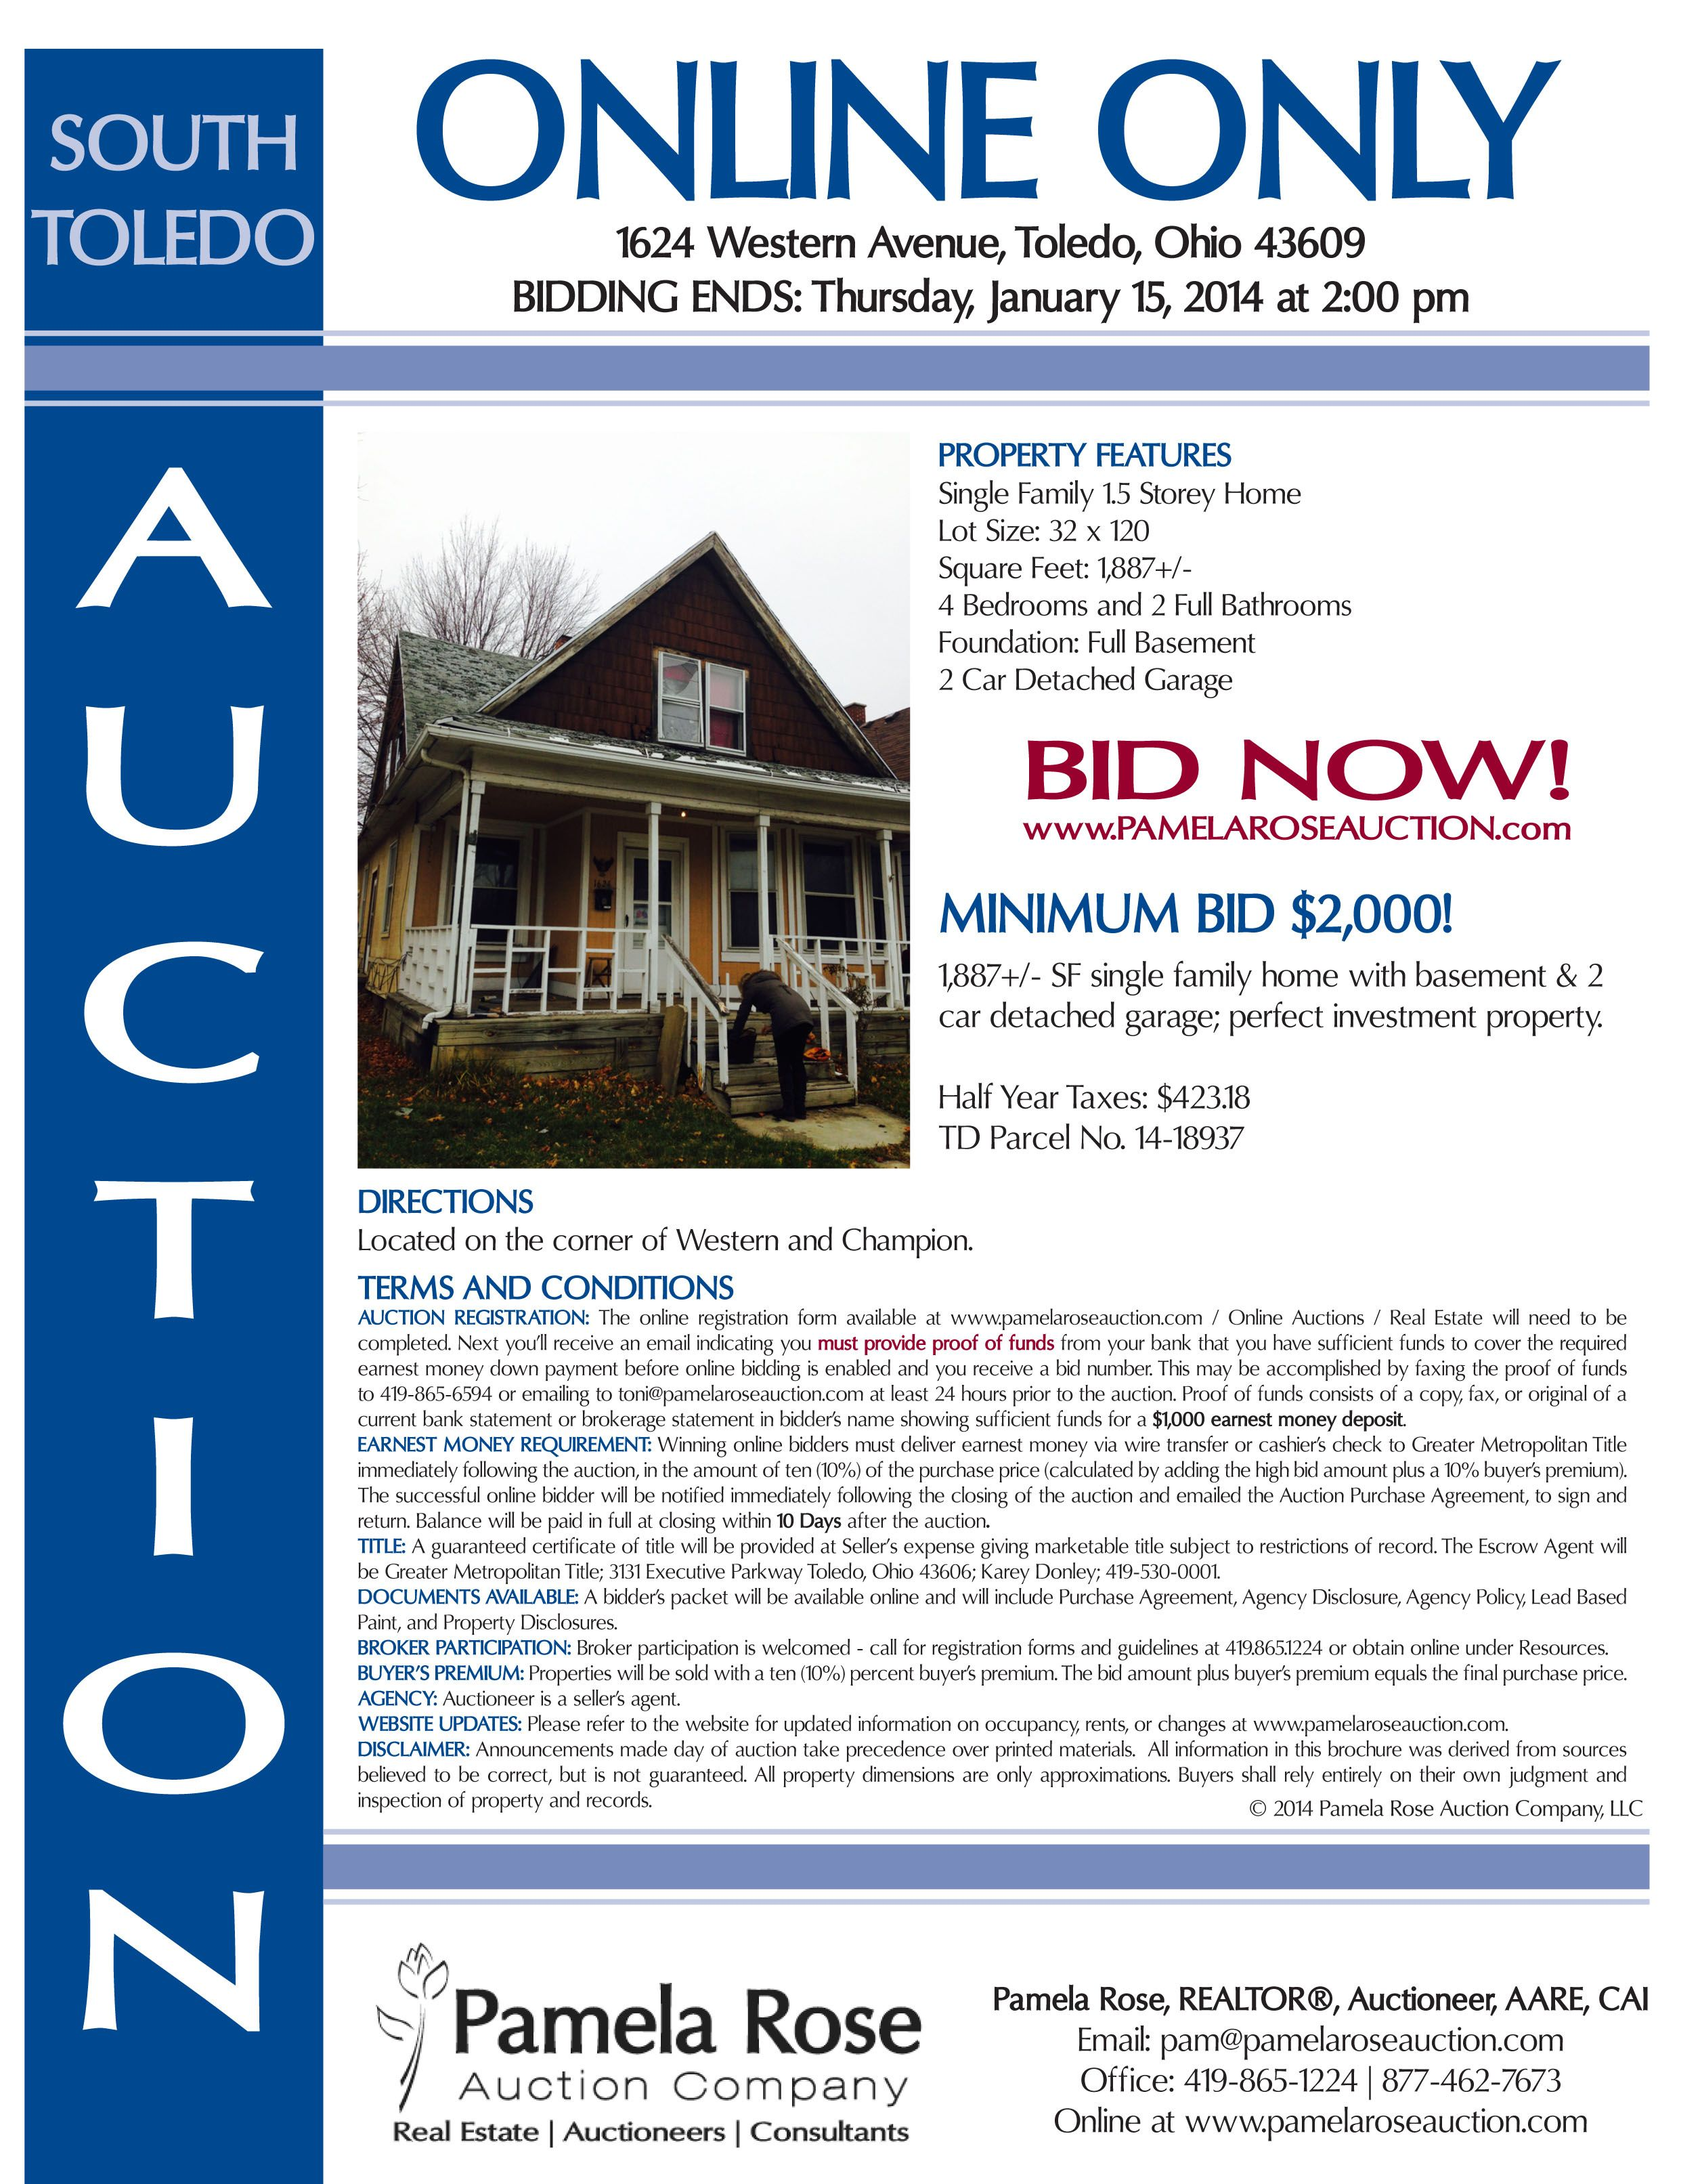 Online Only Auction In South Toledo Minimum Bid 2 000 1624